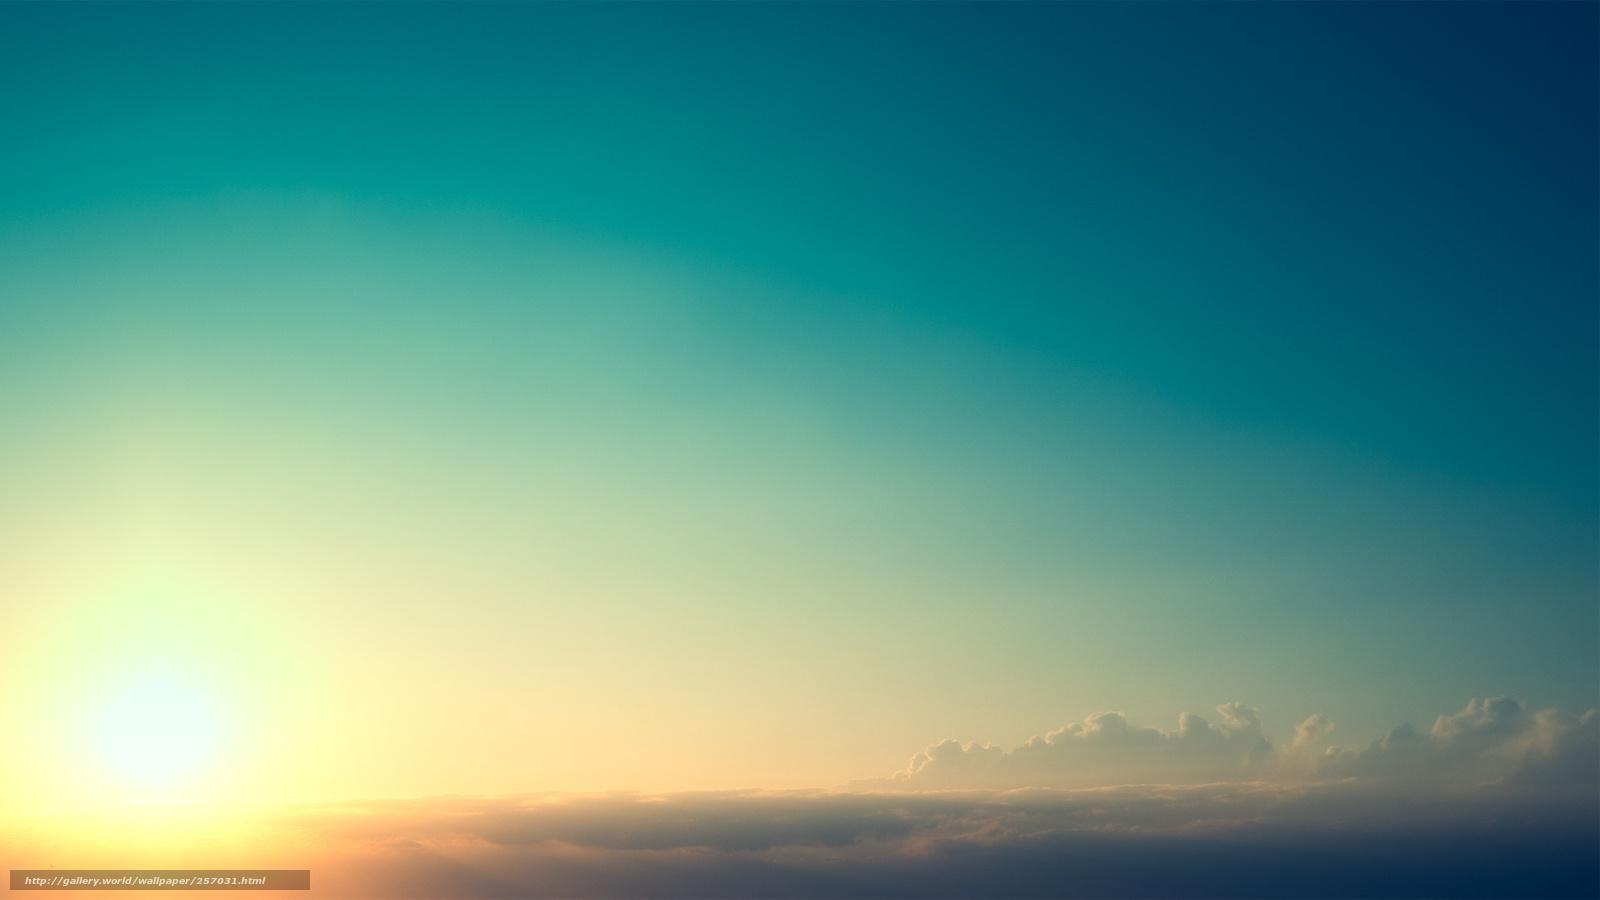 download wallpaper sunset turquoise sun beautifully